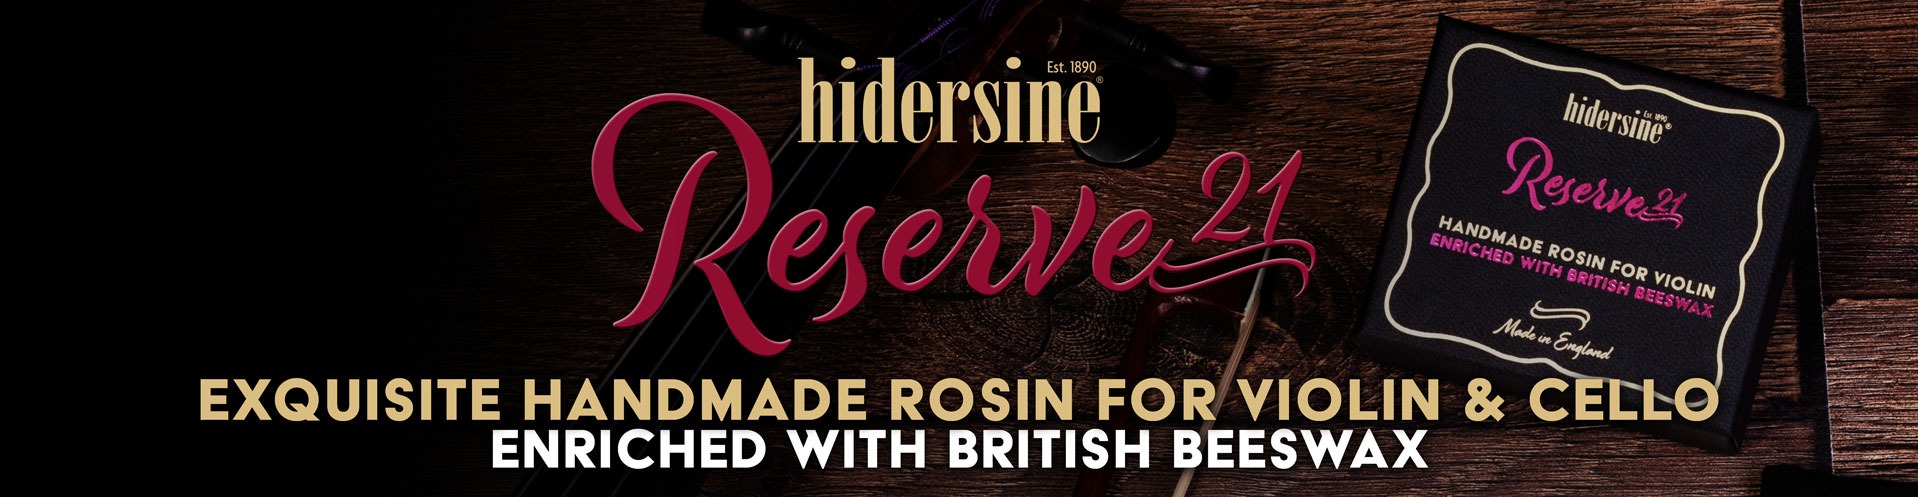 Hidersine-Reserve-21-Web-Banner